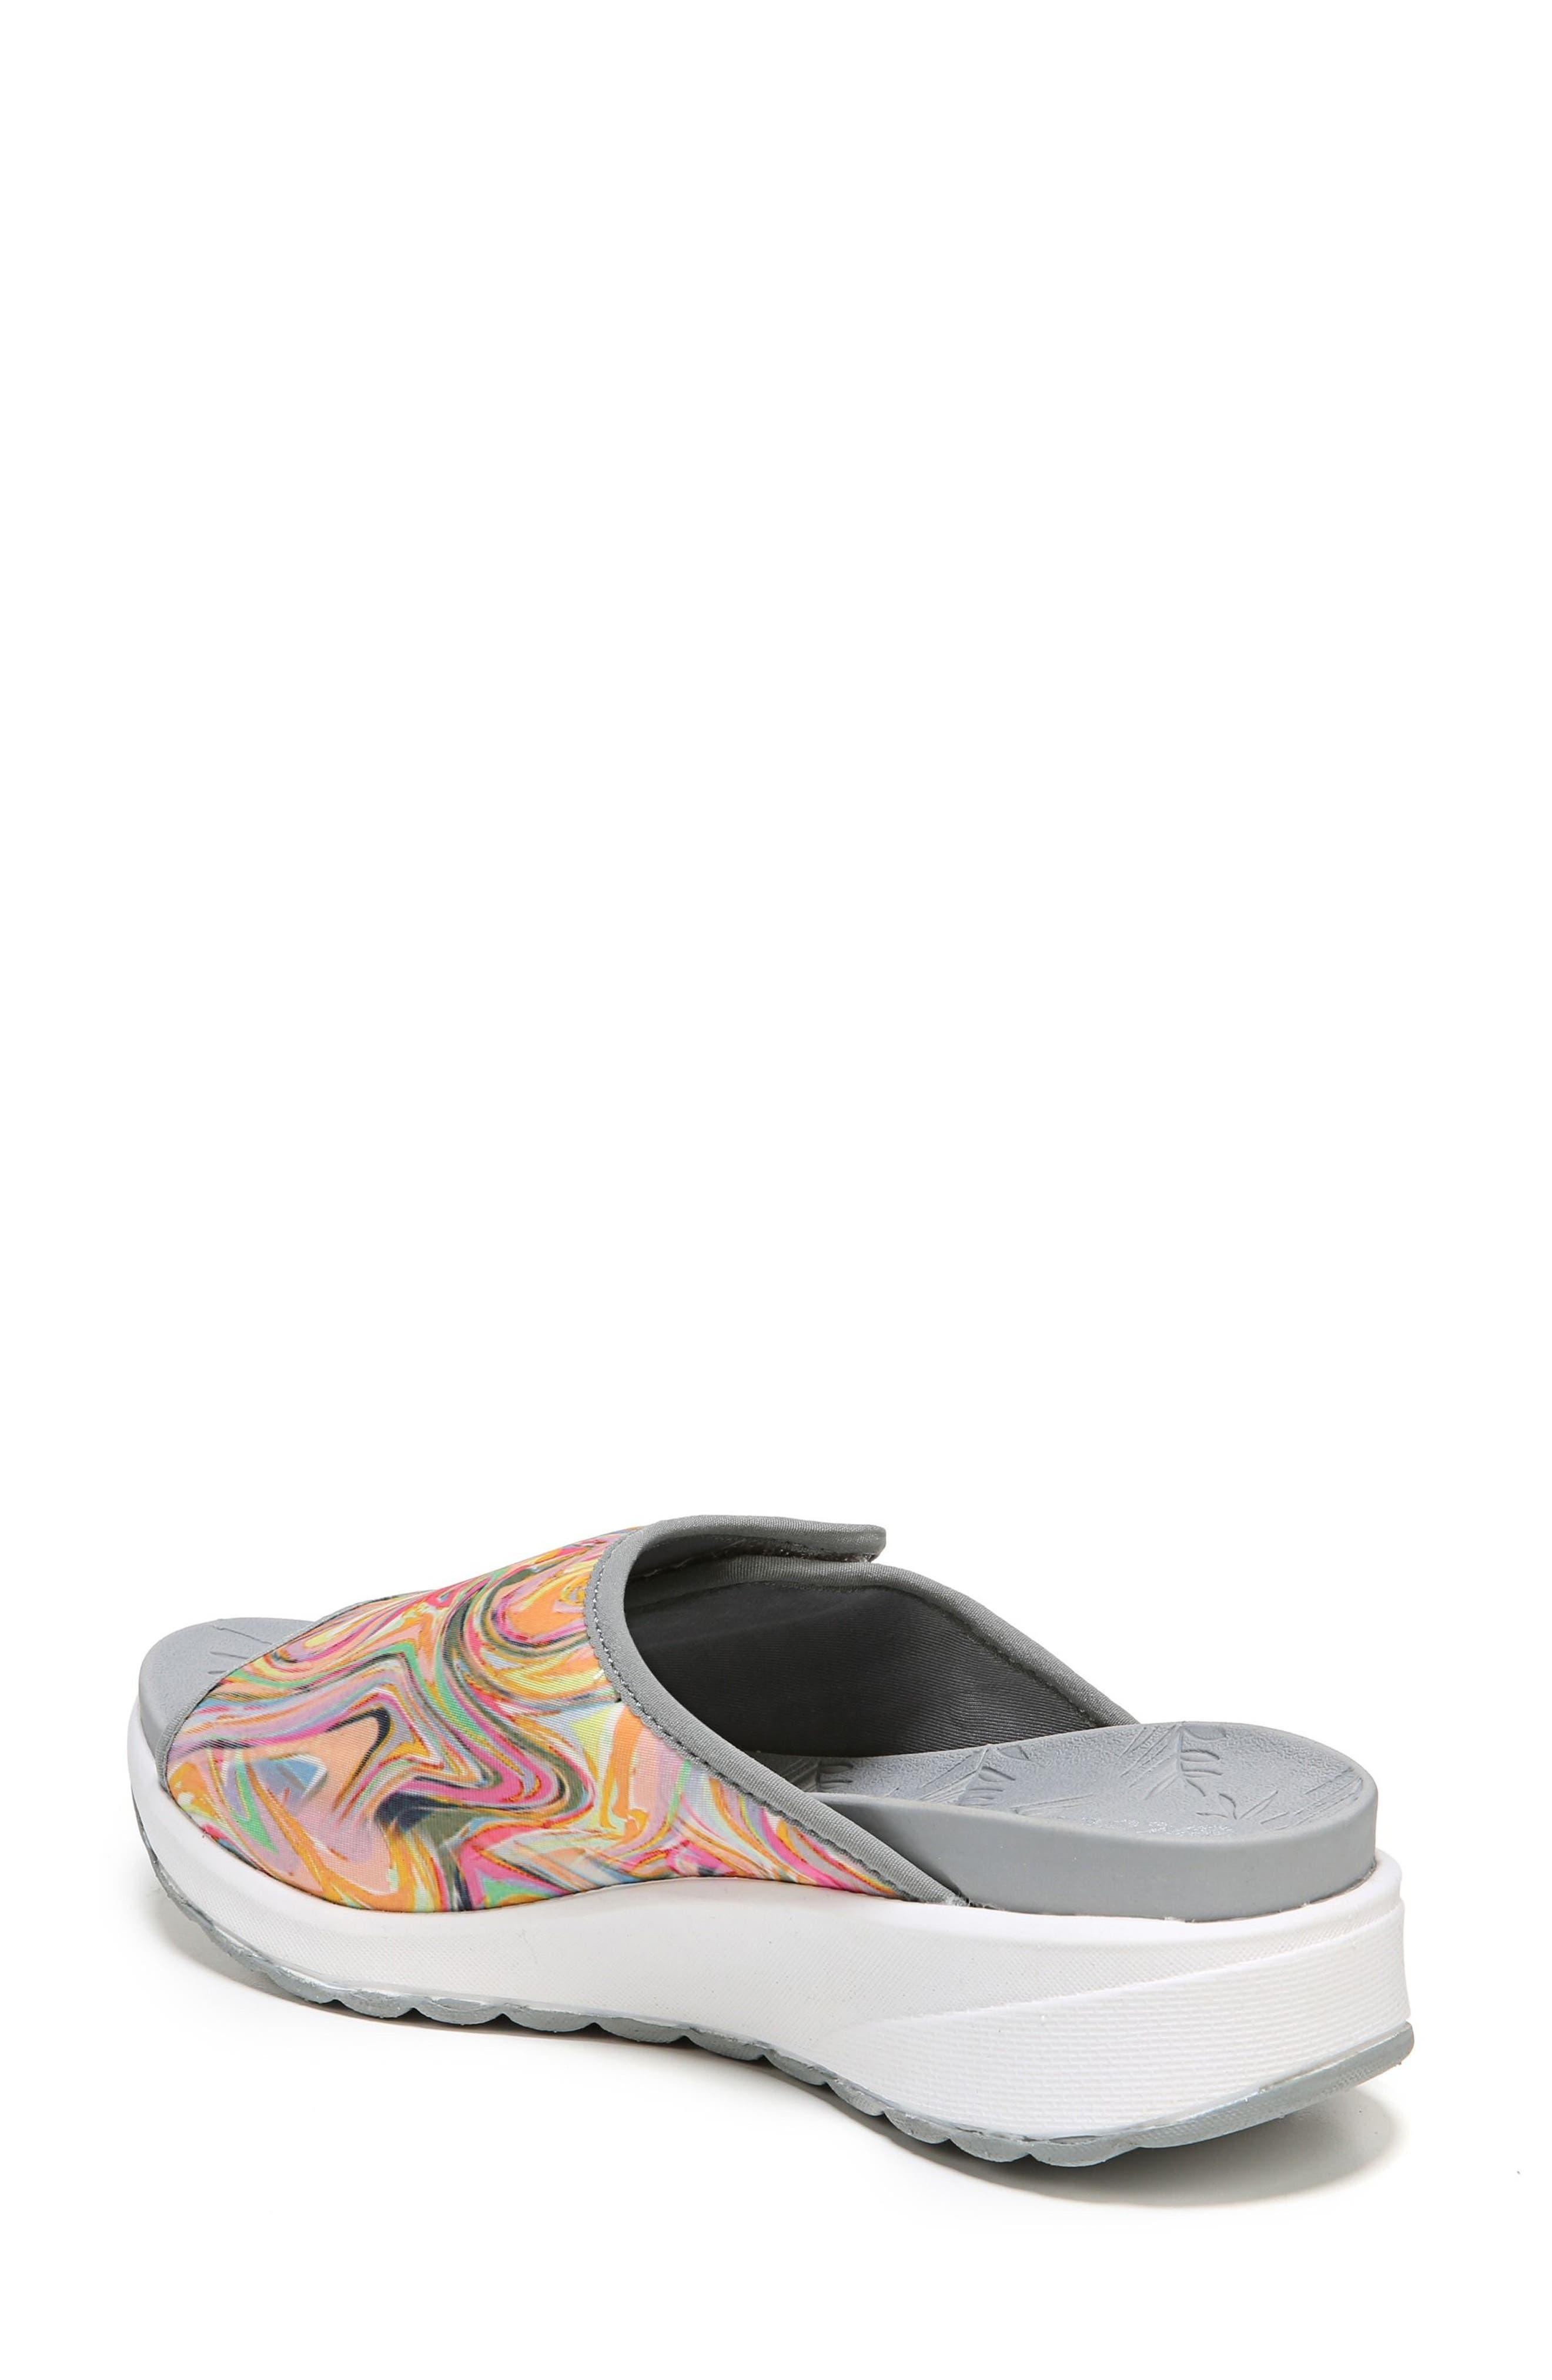 Galaxy Slide Sandal,                             Alternate thumbnail 2, color,                             Lava Fabric